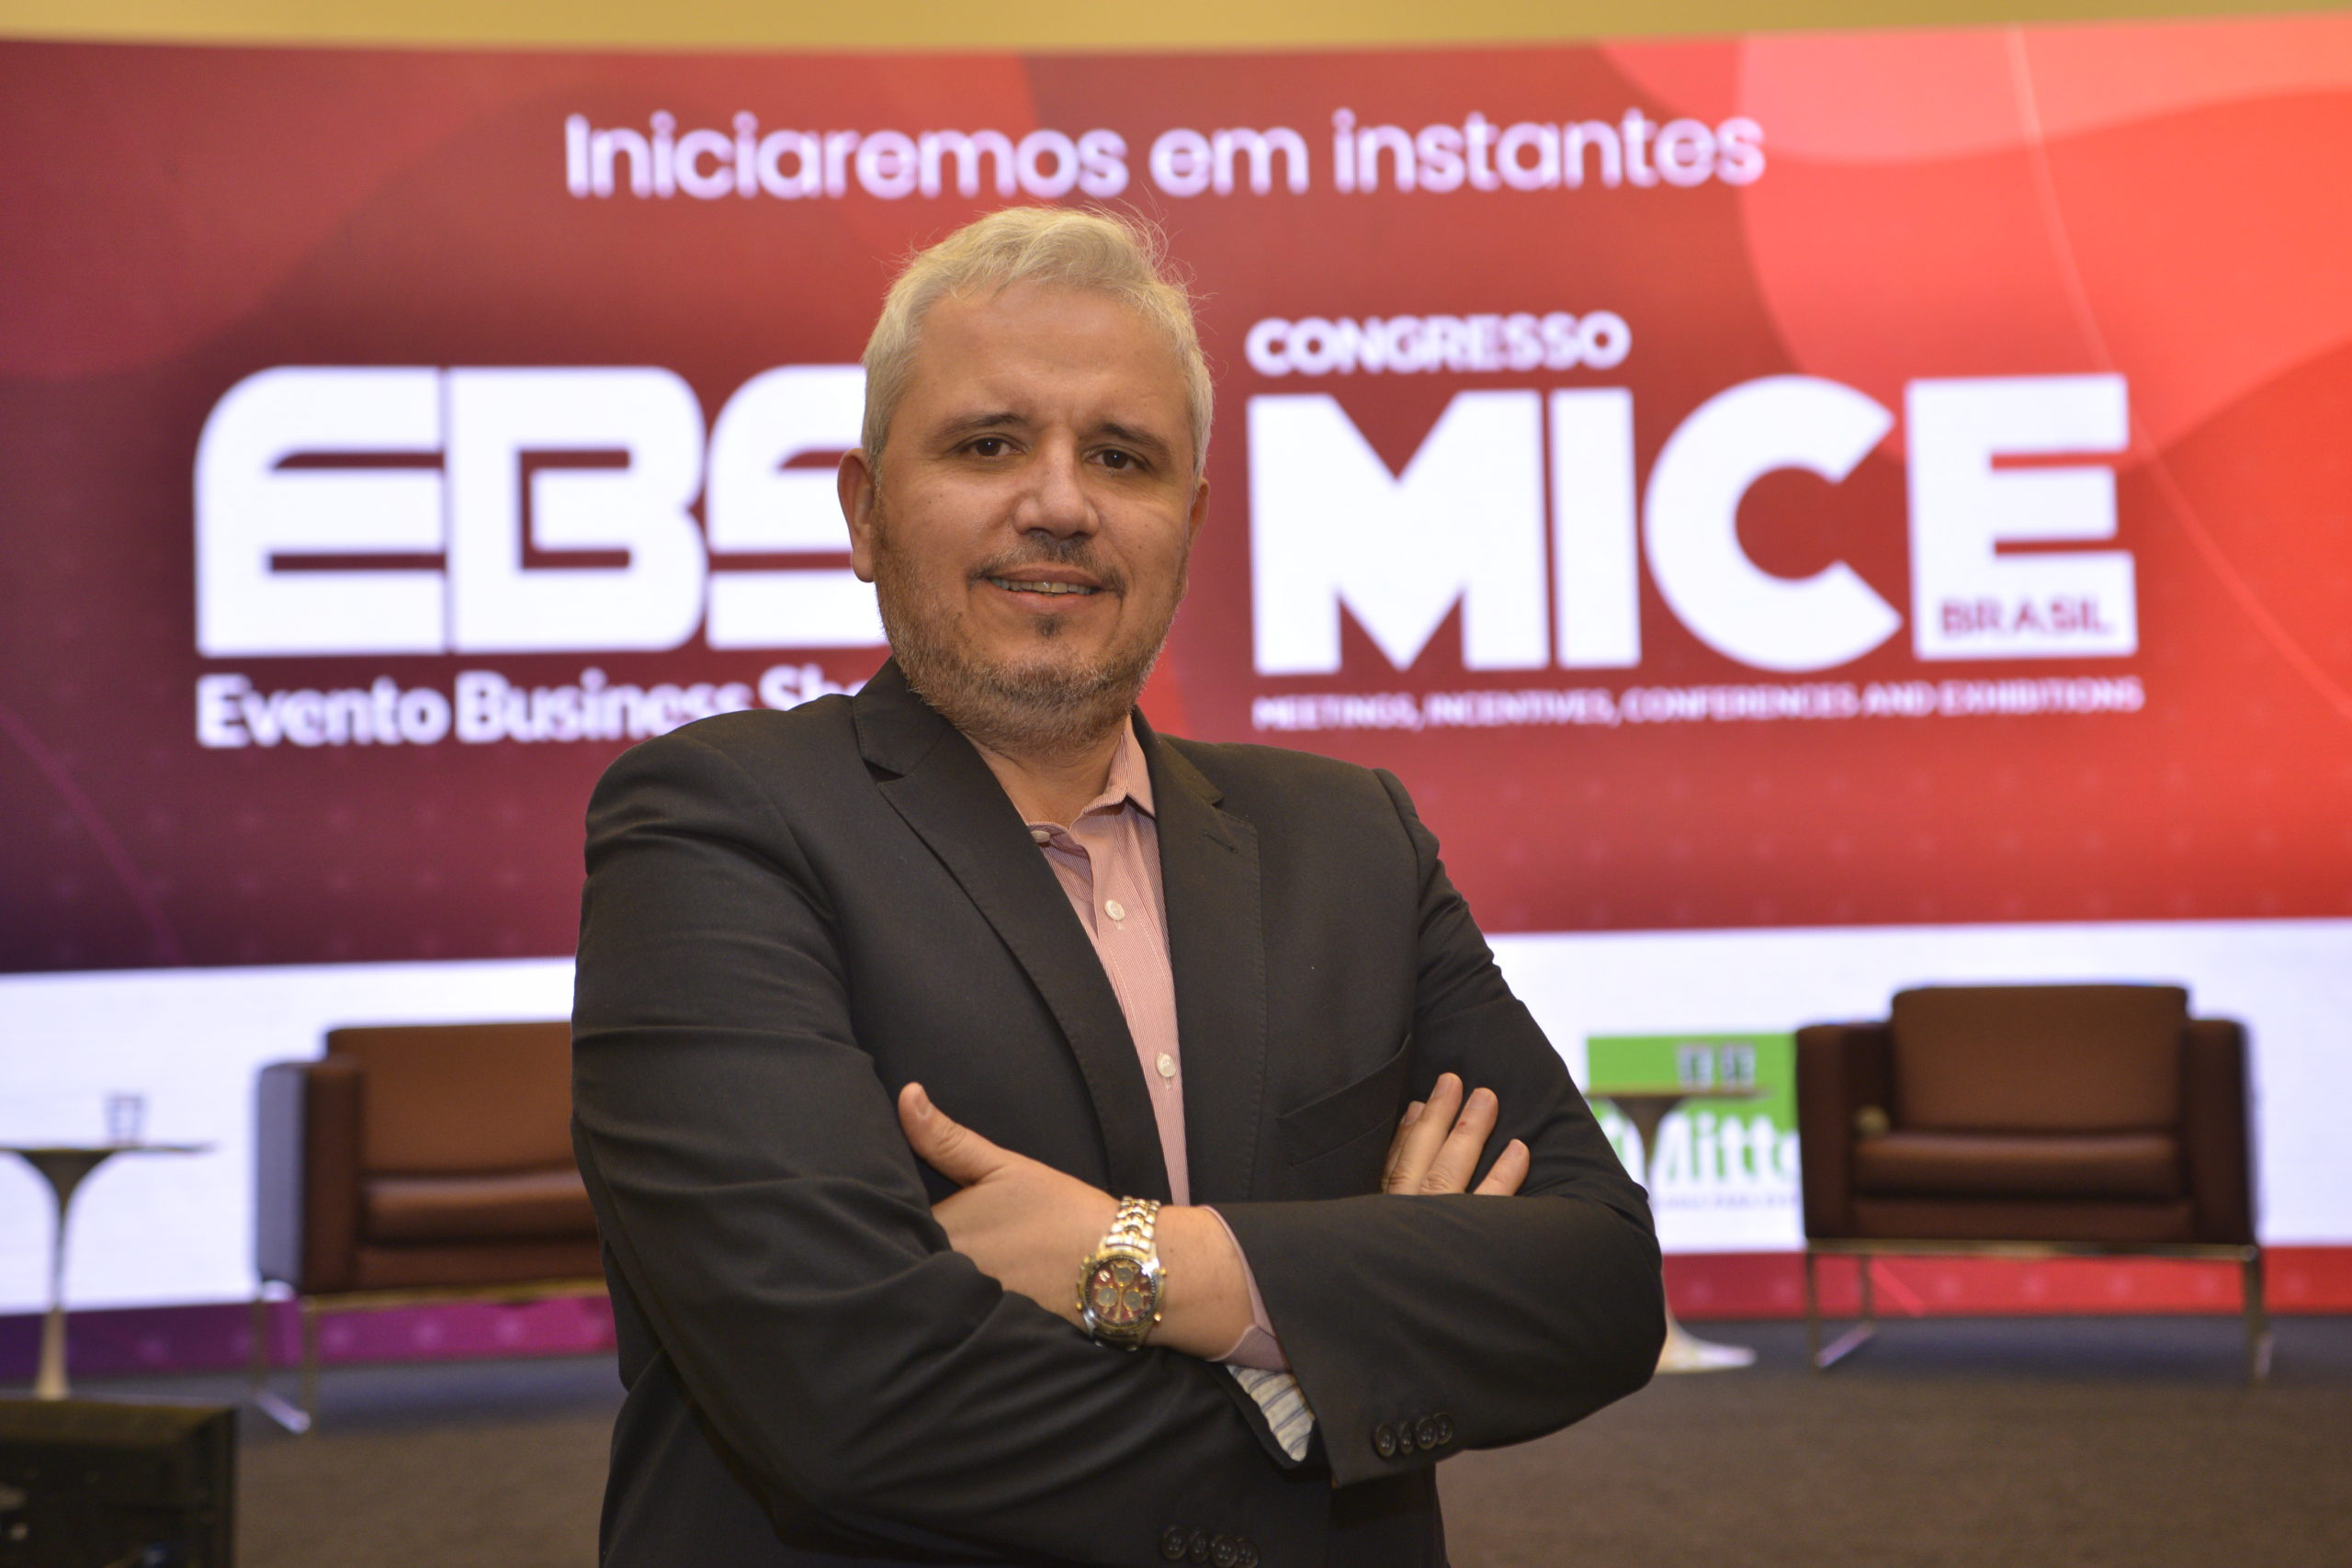 Feira EBS vai reunir compradores e fornecedores do setor MICE durante o Speed Meeting EBS